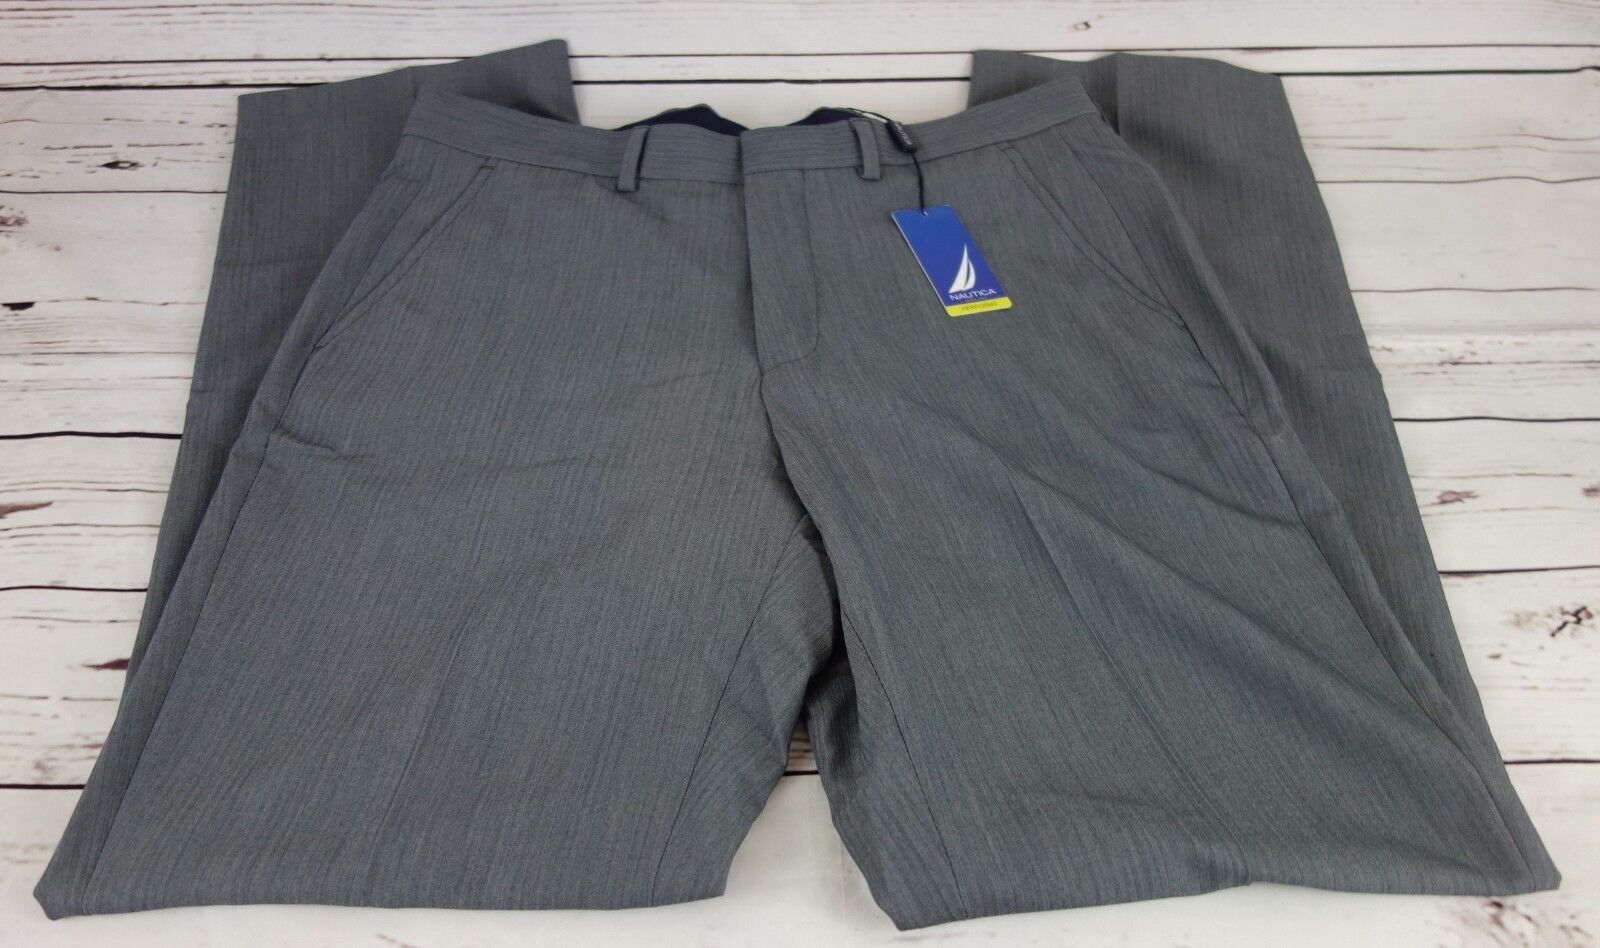 New Nautica Men's Classic Fit Stretch Pants Light Grey 34W x 32L MSRP